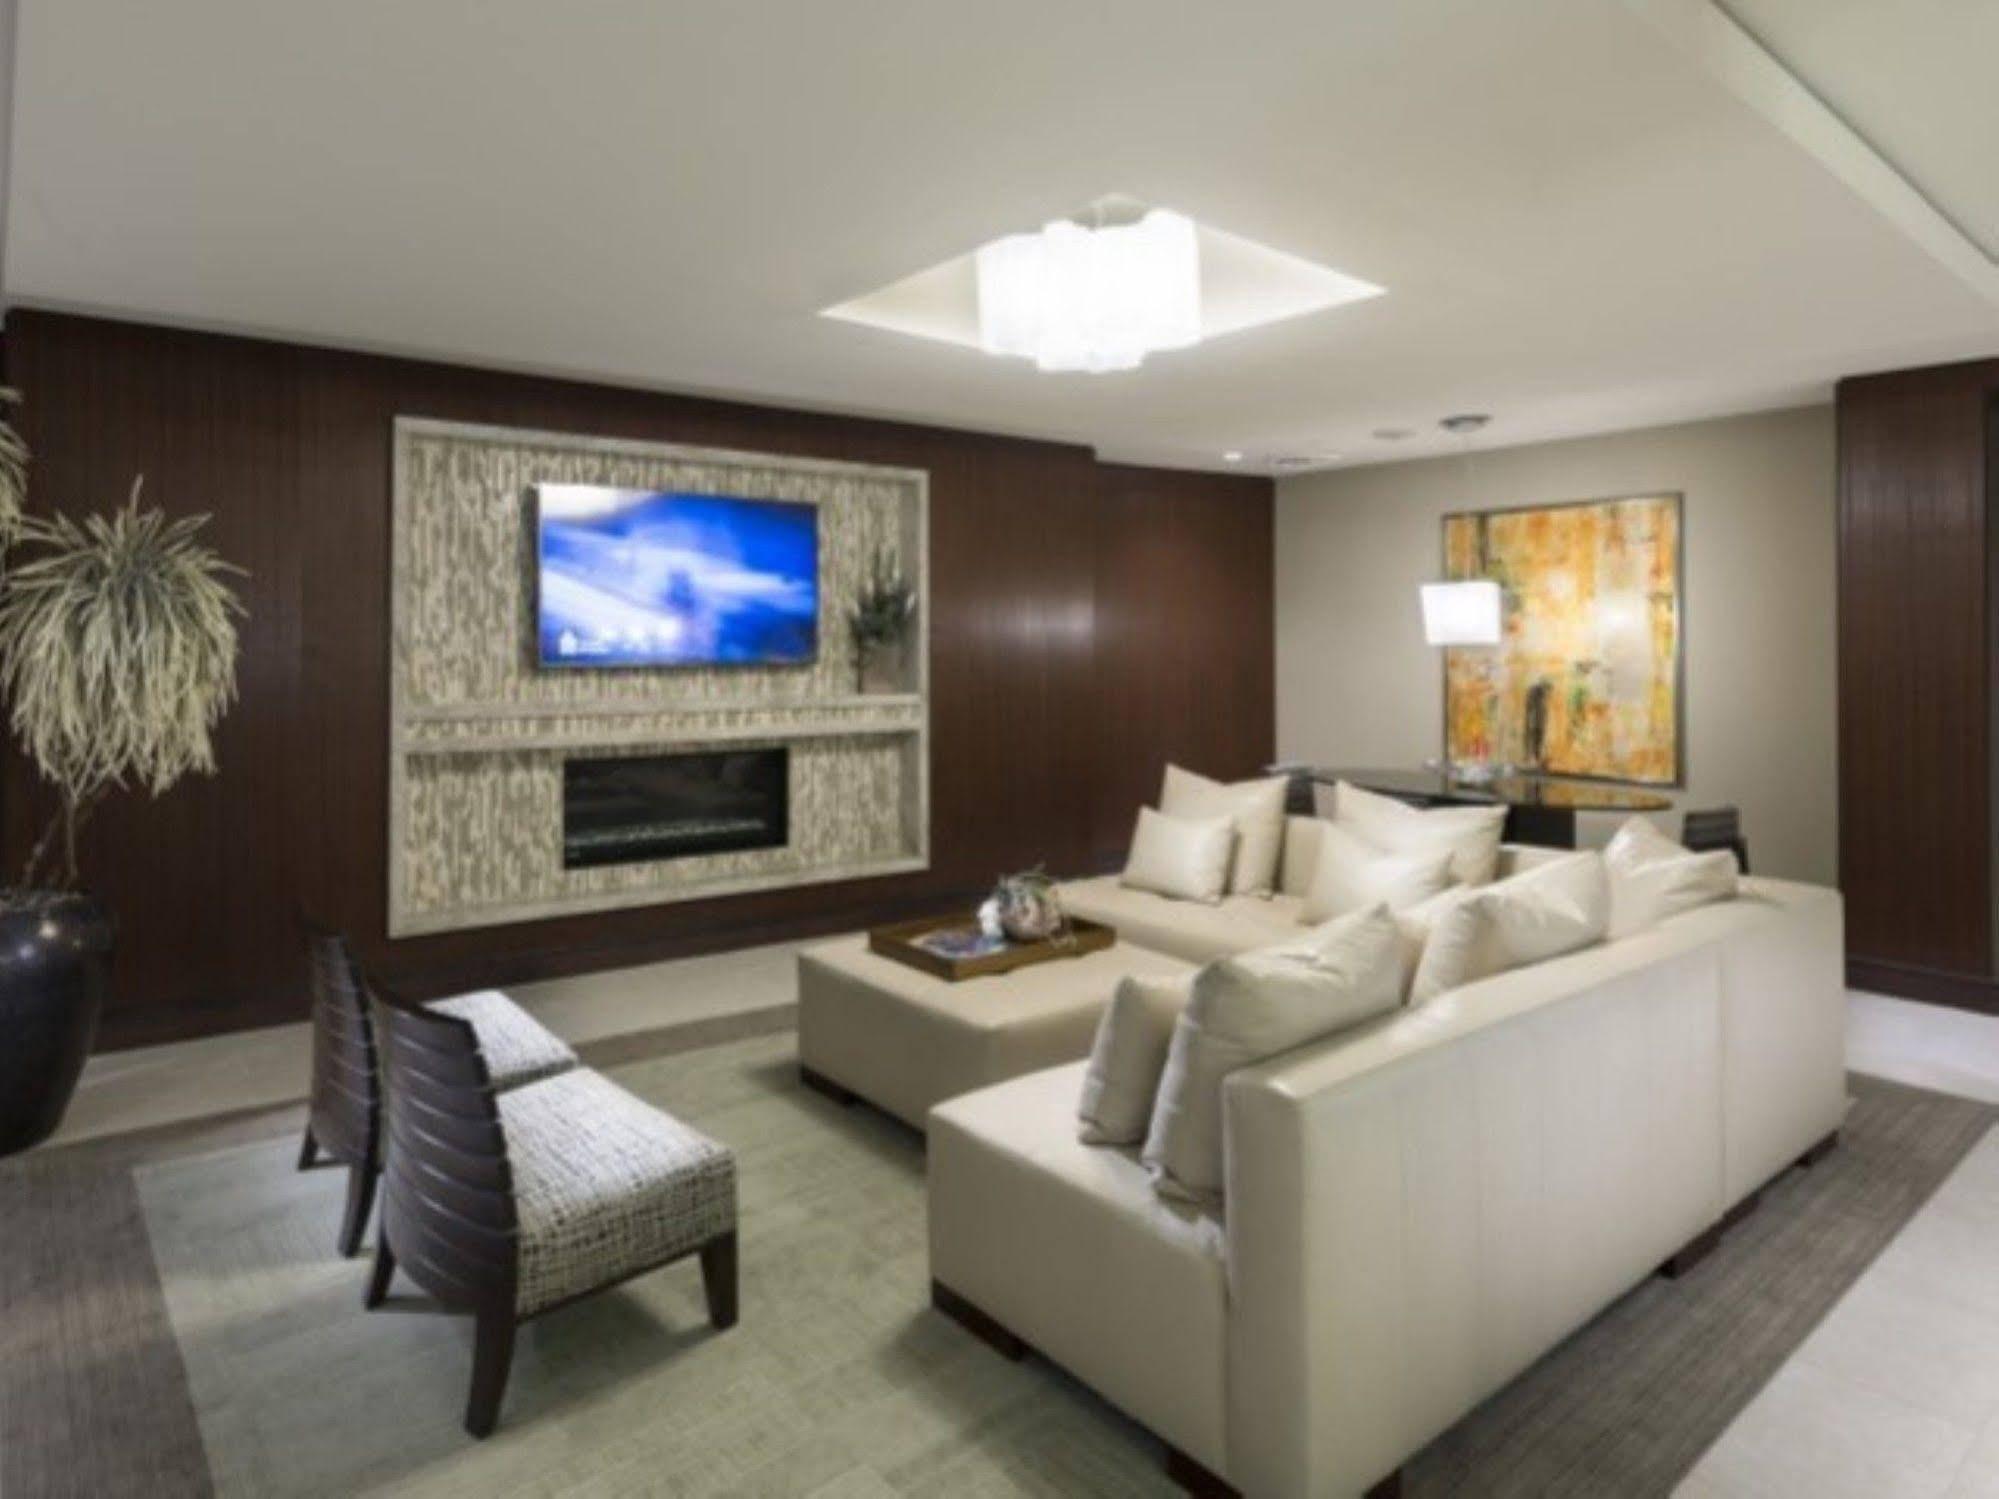 Global Luxury Suites At Cambridge Park